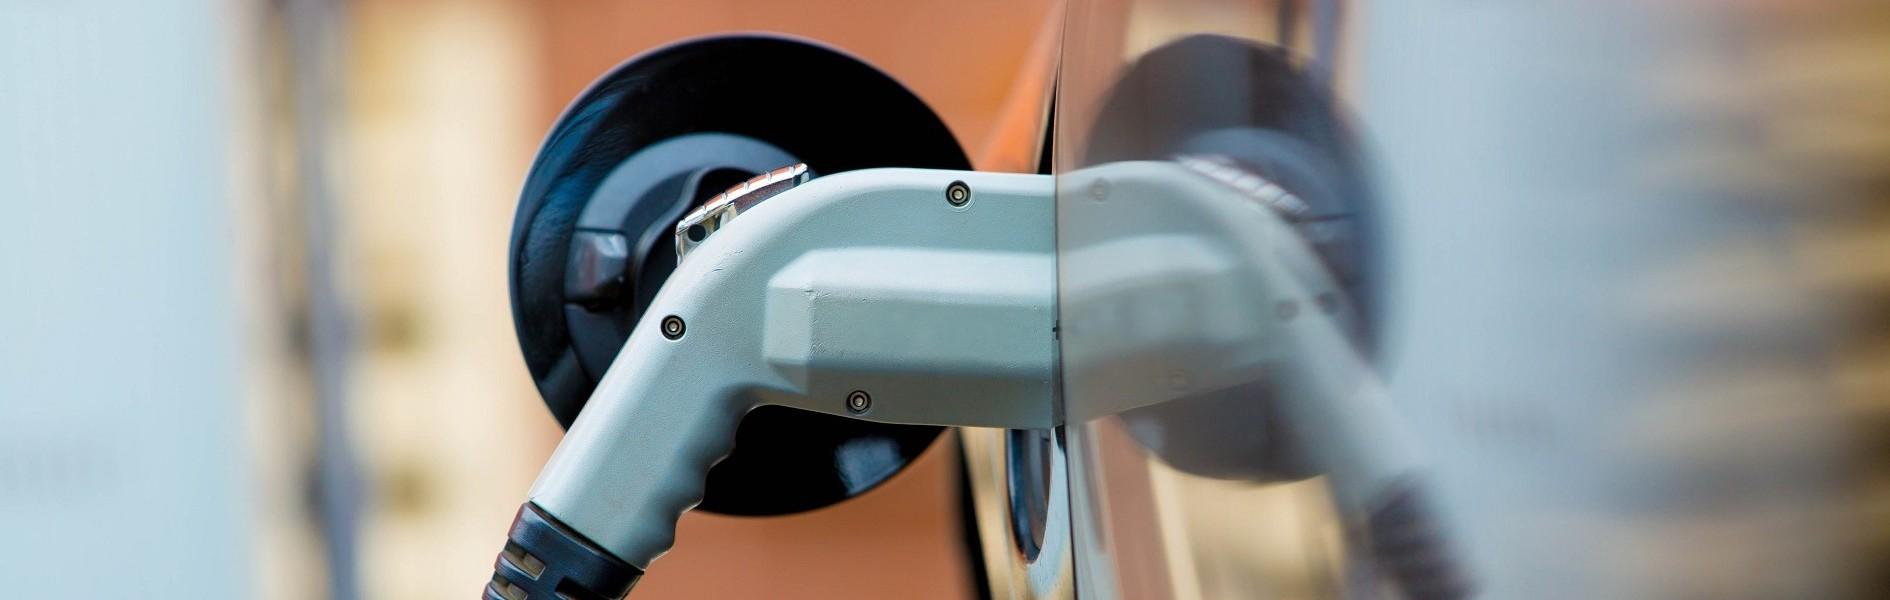 EV charging ecosystem